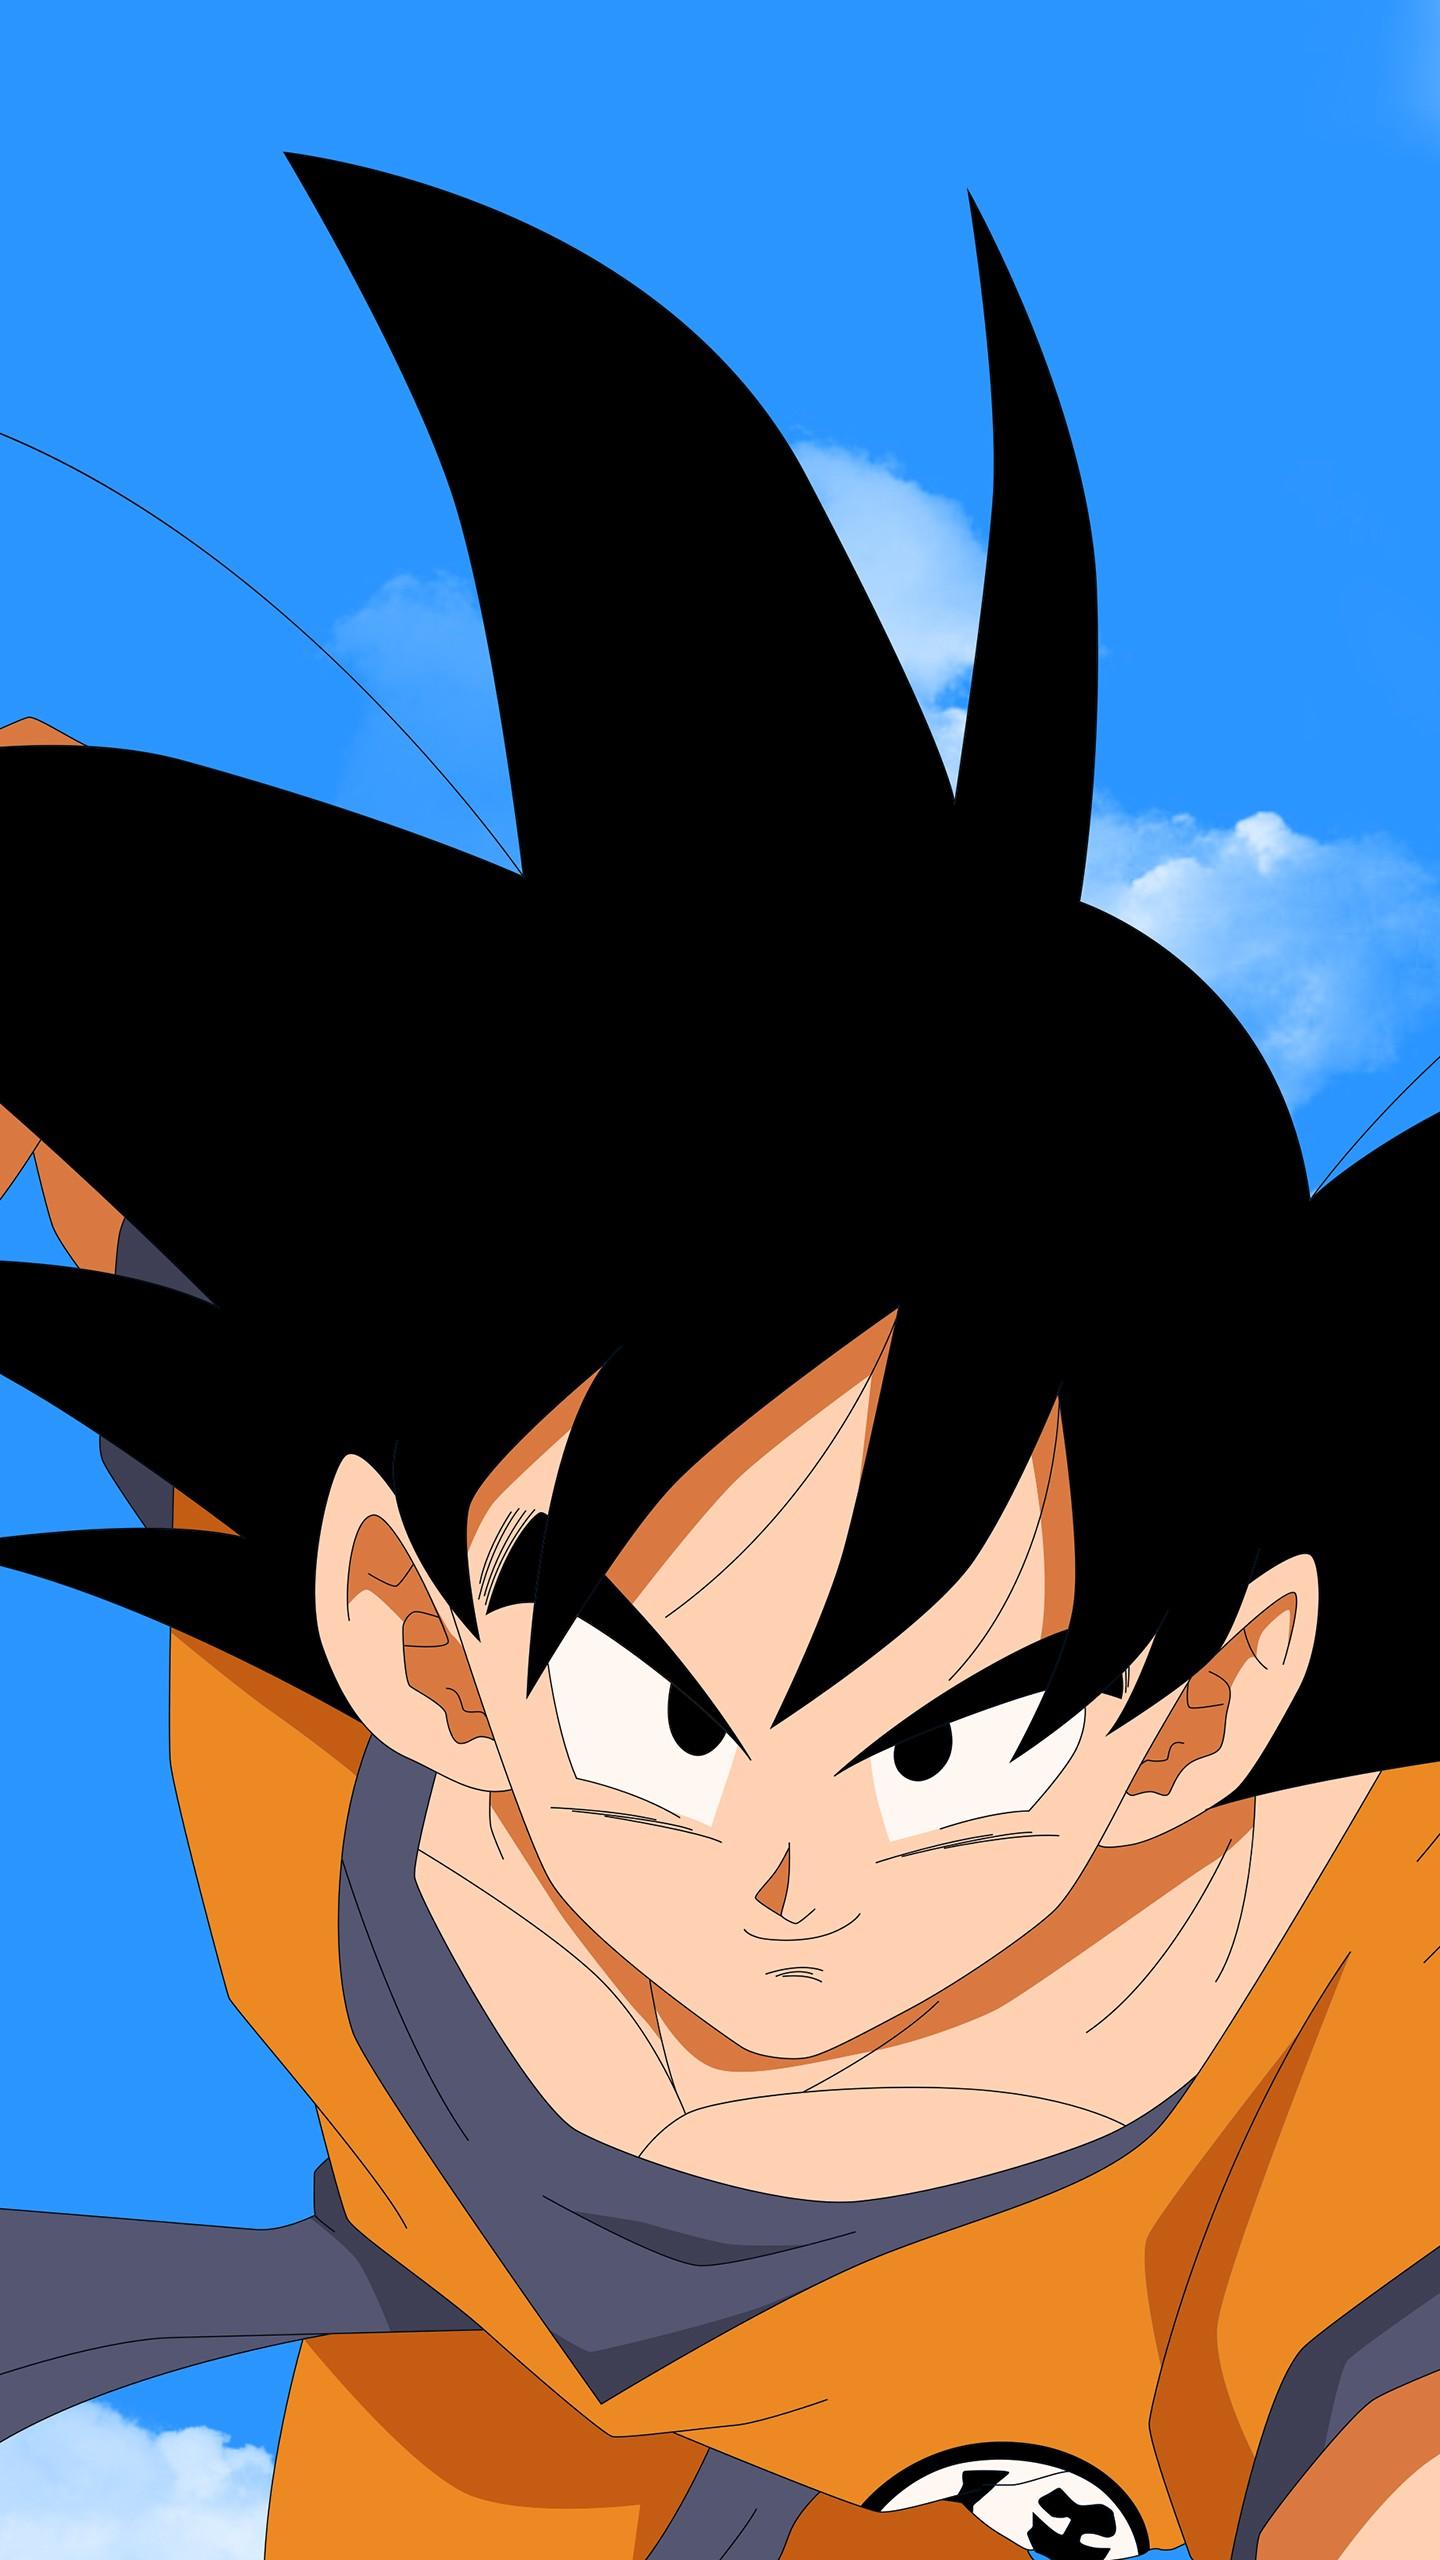 Iphone 7 Plus Anime Girls Wallpapers Goku Hd 5k Wallpapers Hd Wallpapers Id 25313